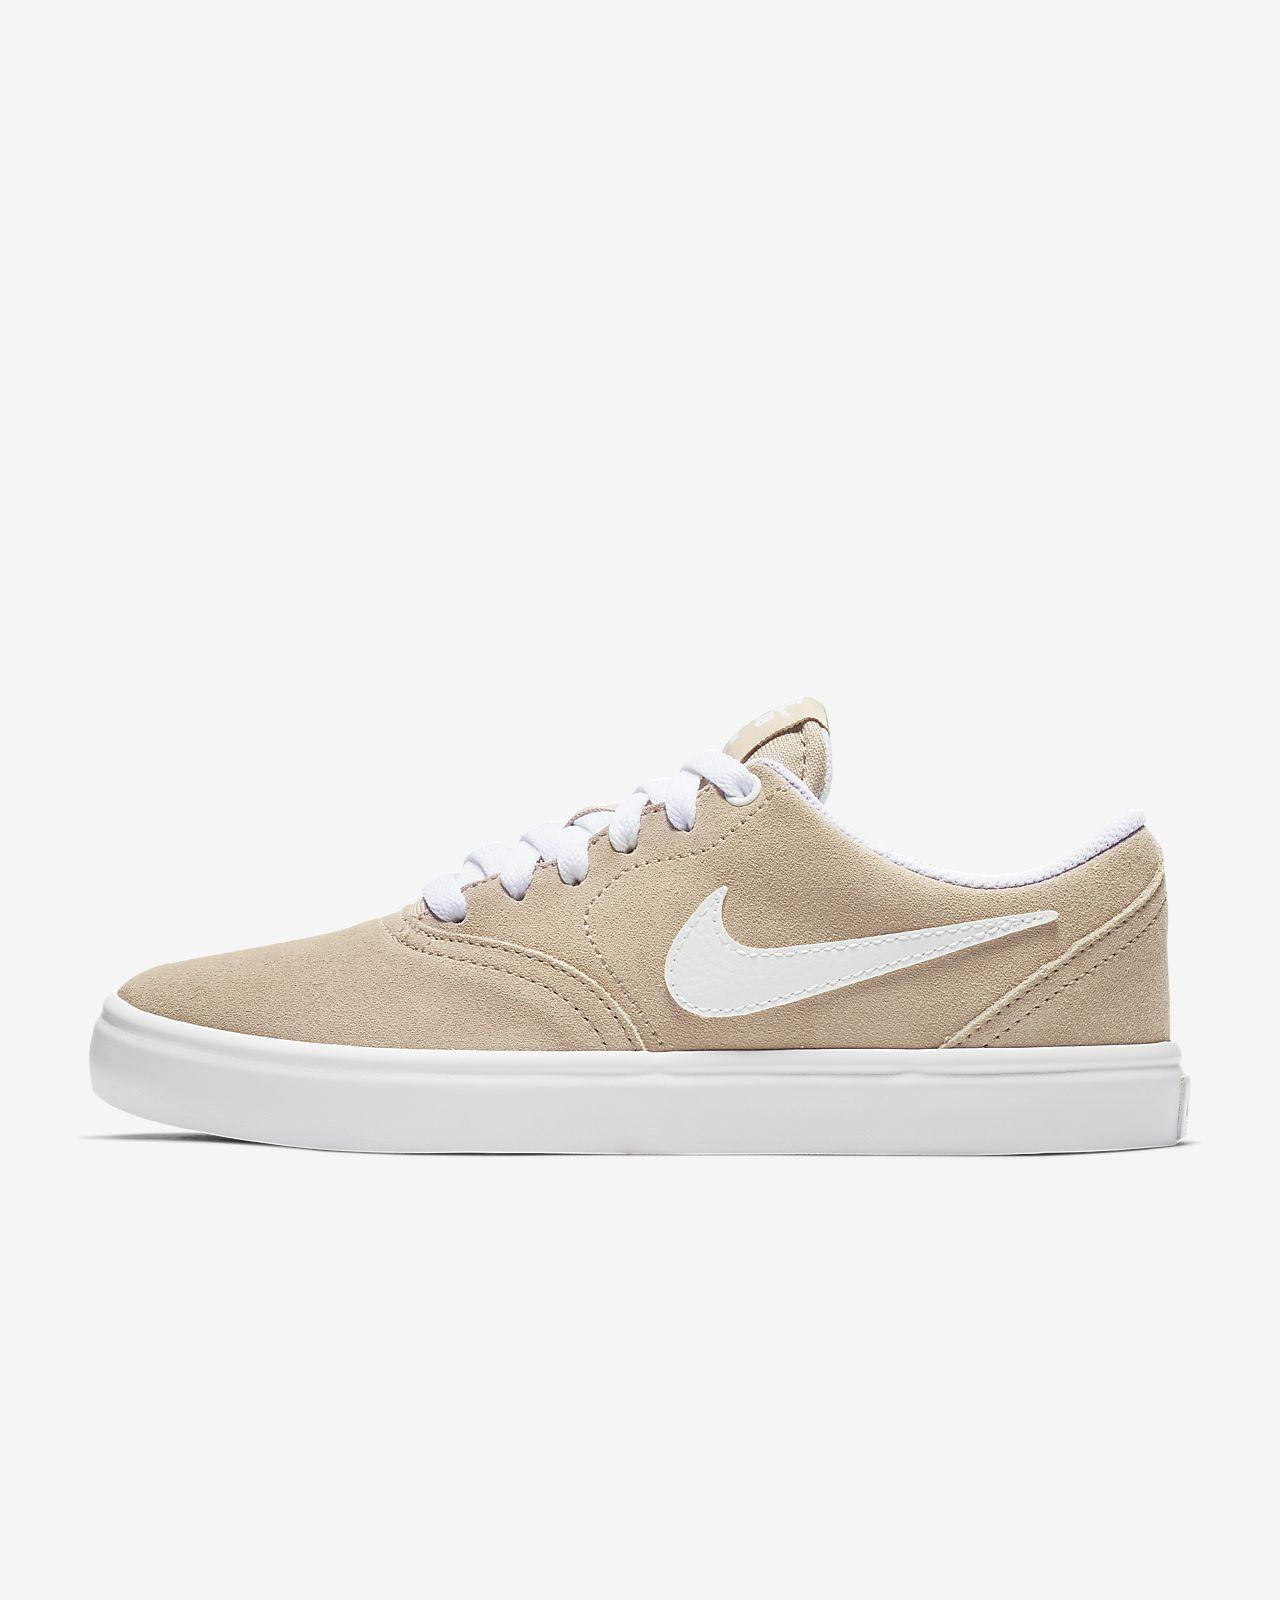 a7e9f1b1a748 Nike SB Check Solarsoft Women s Skate Shoe. Nike.com GB